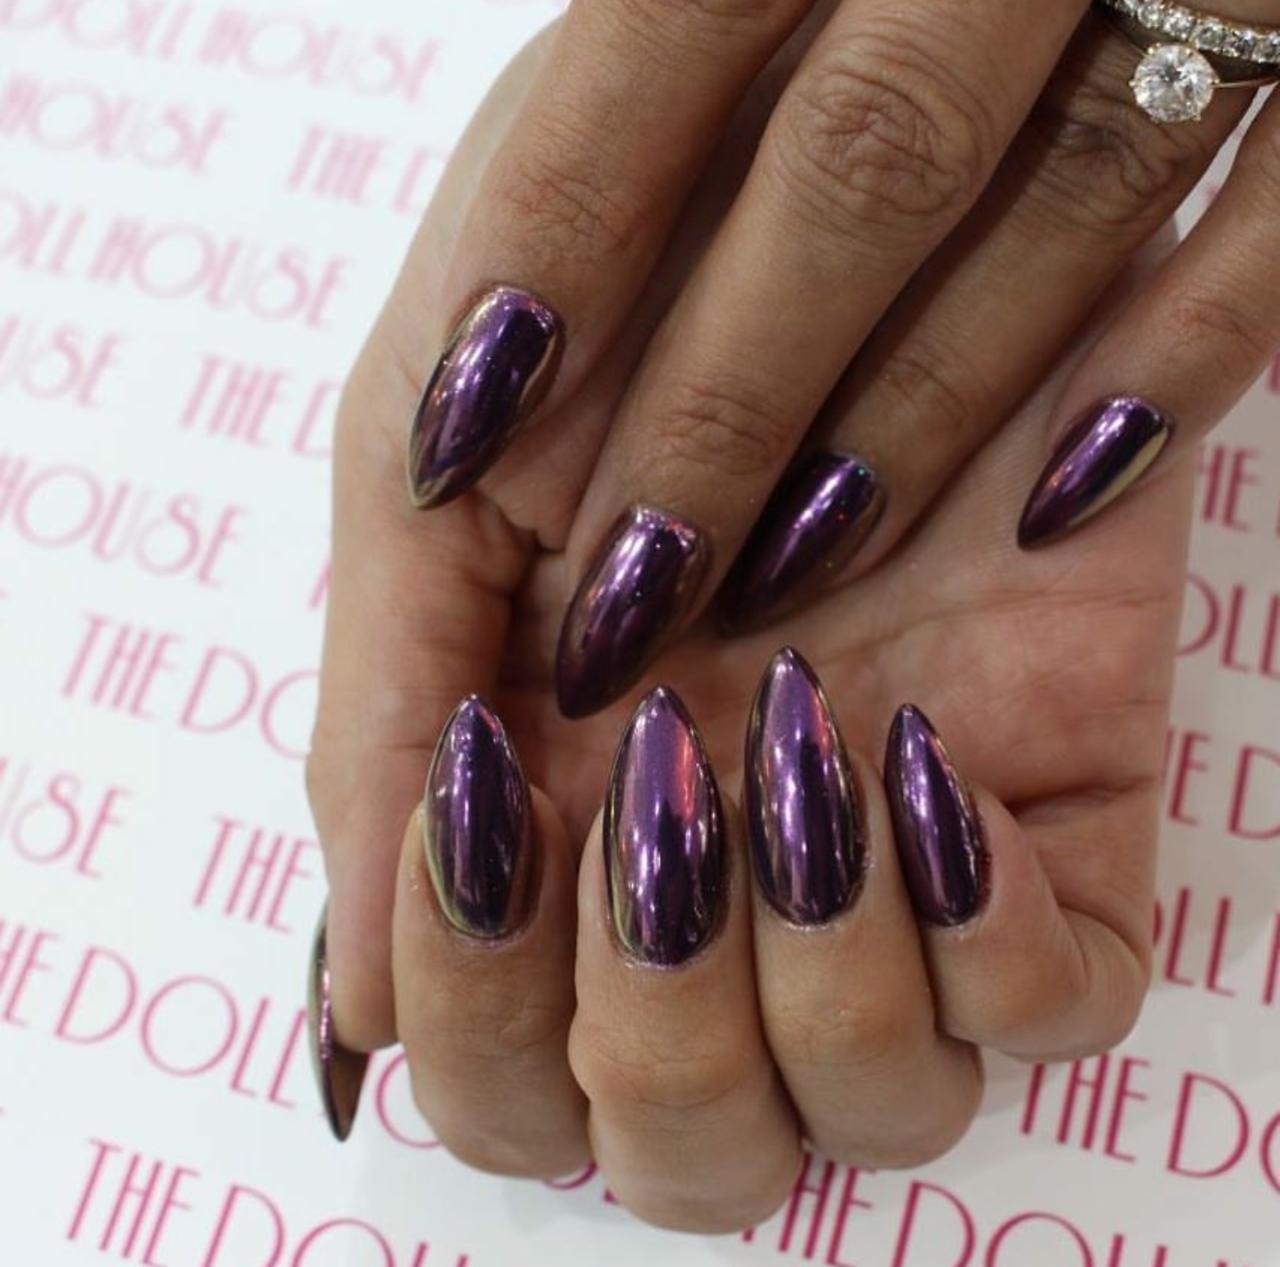 PURPLE CHROME - Nails, Nails, Nails✌ | Nail Ideas | Pinterest